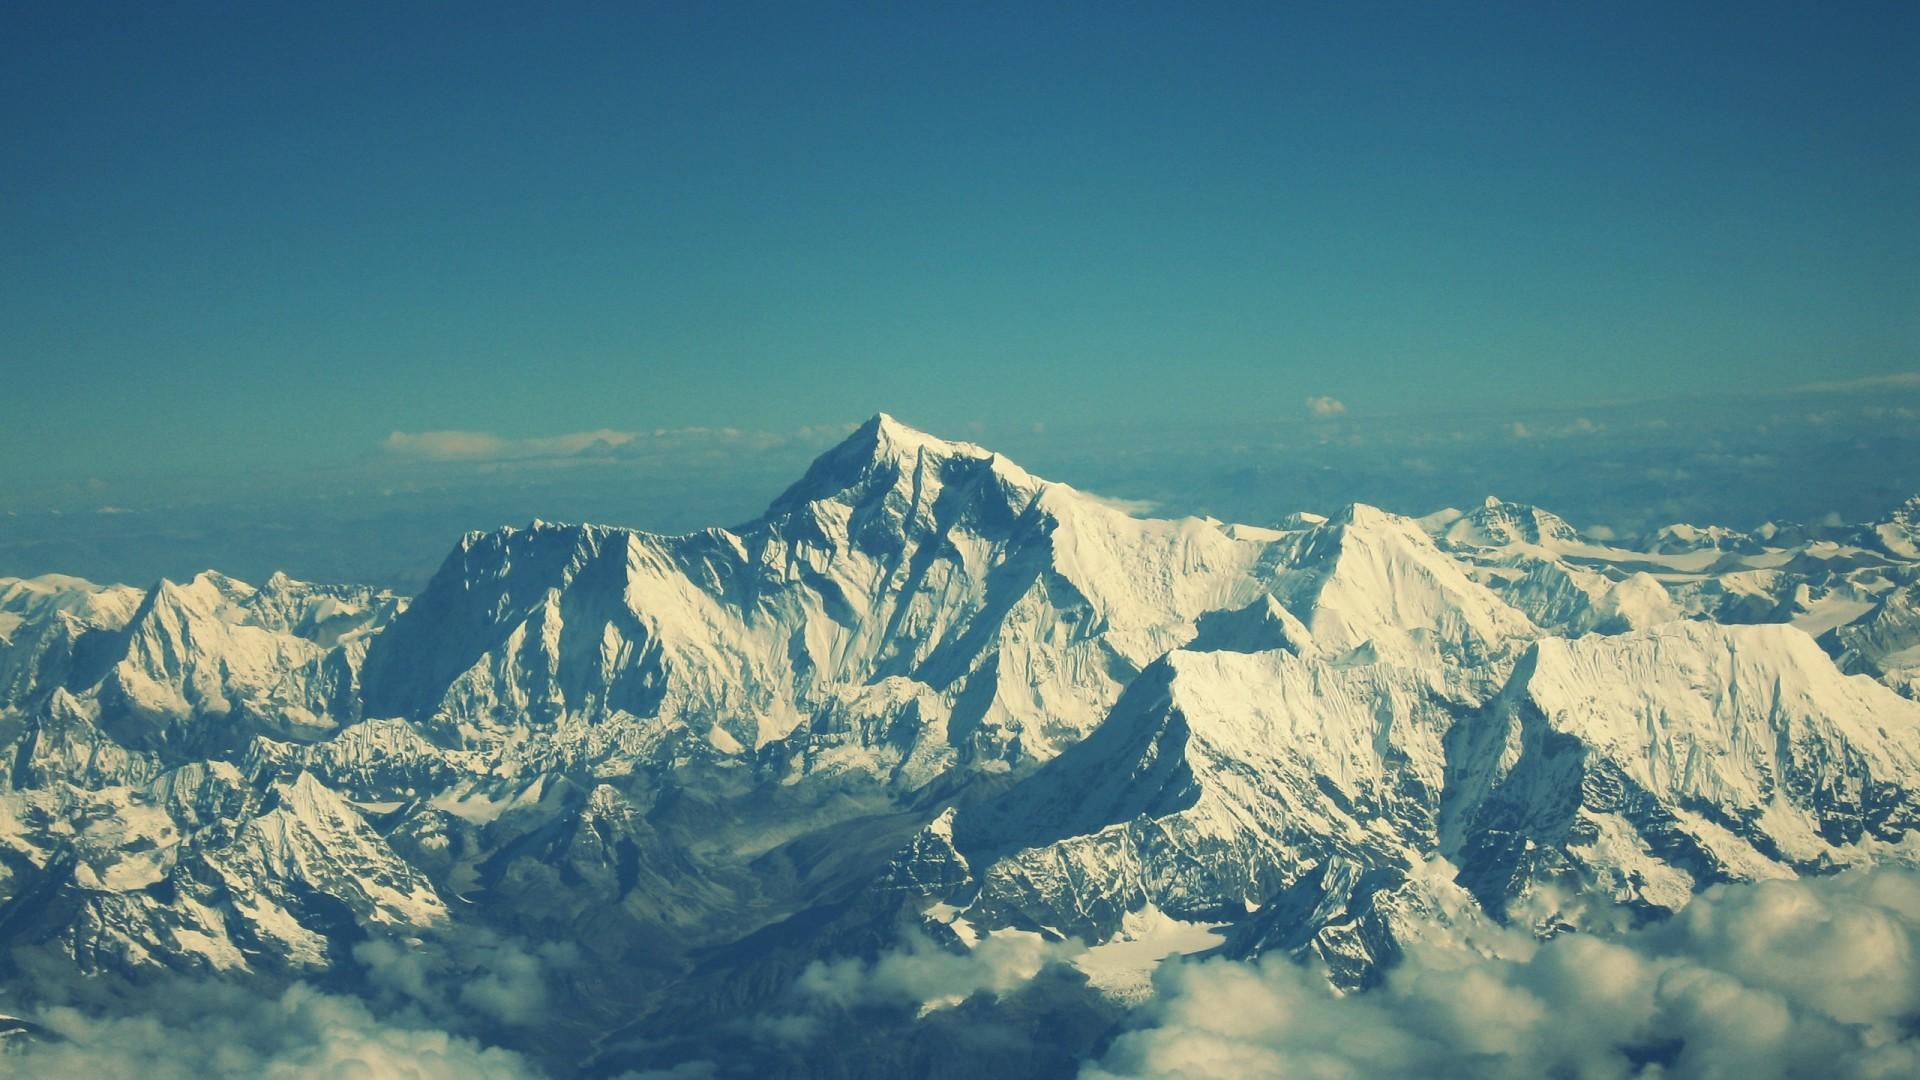 … Background Full HD 1080p. Wallpaper everest, mountain, sky,  tops